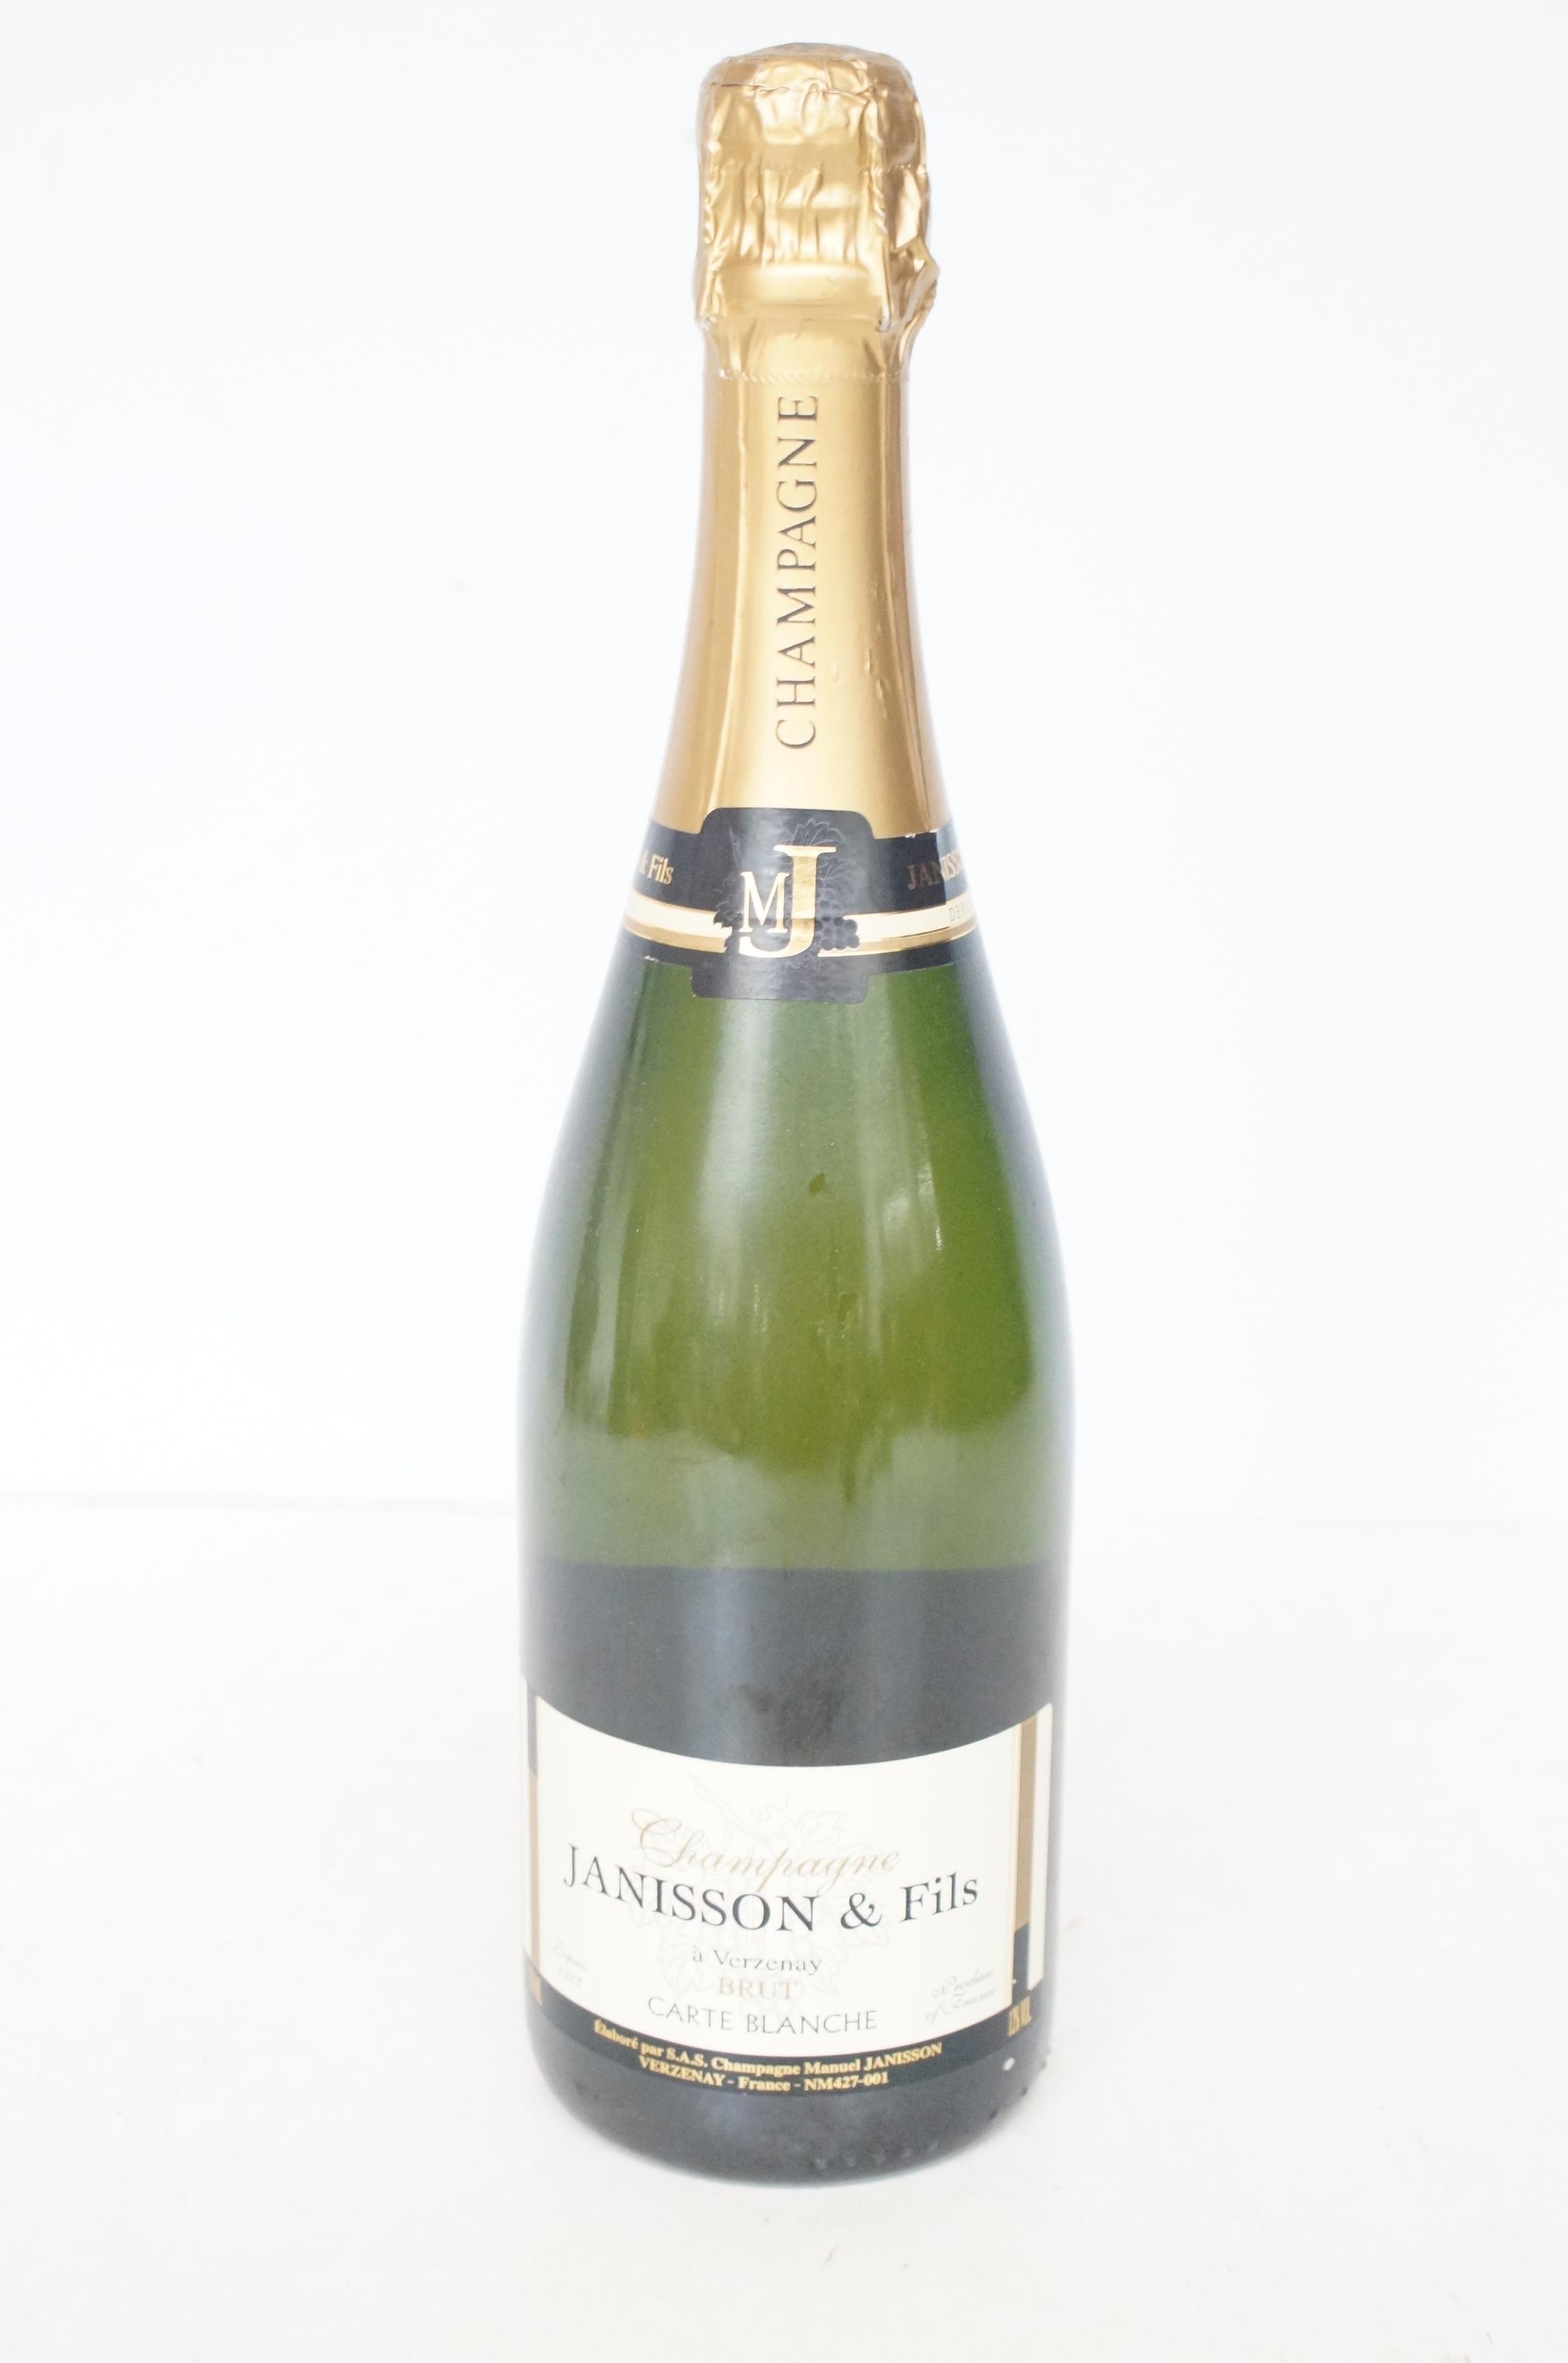 Lot 94 - Janisson & Fils champayne